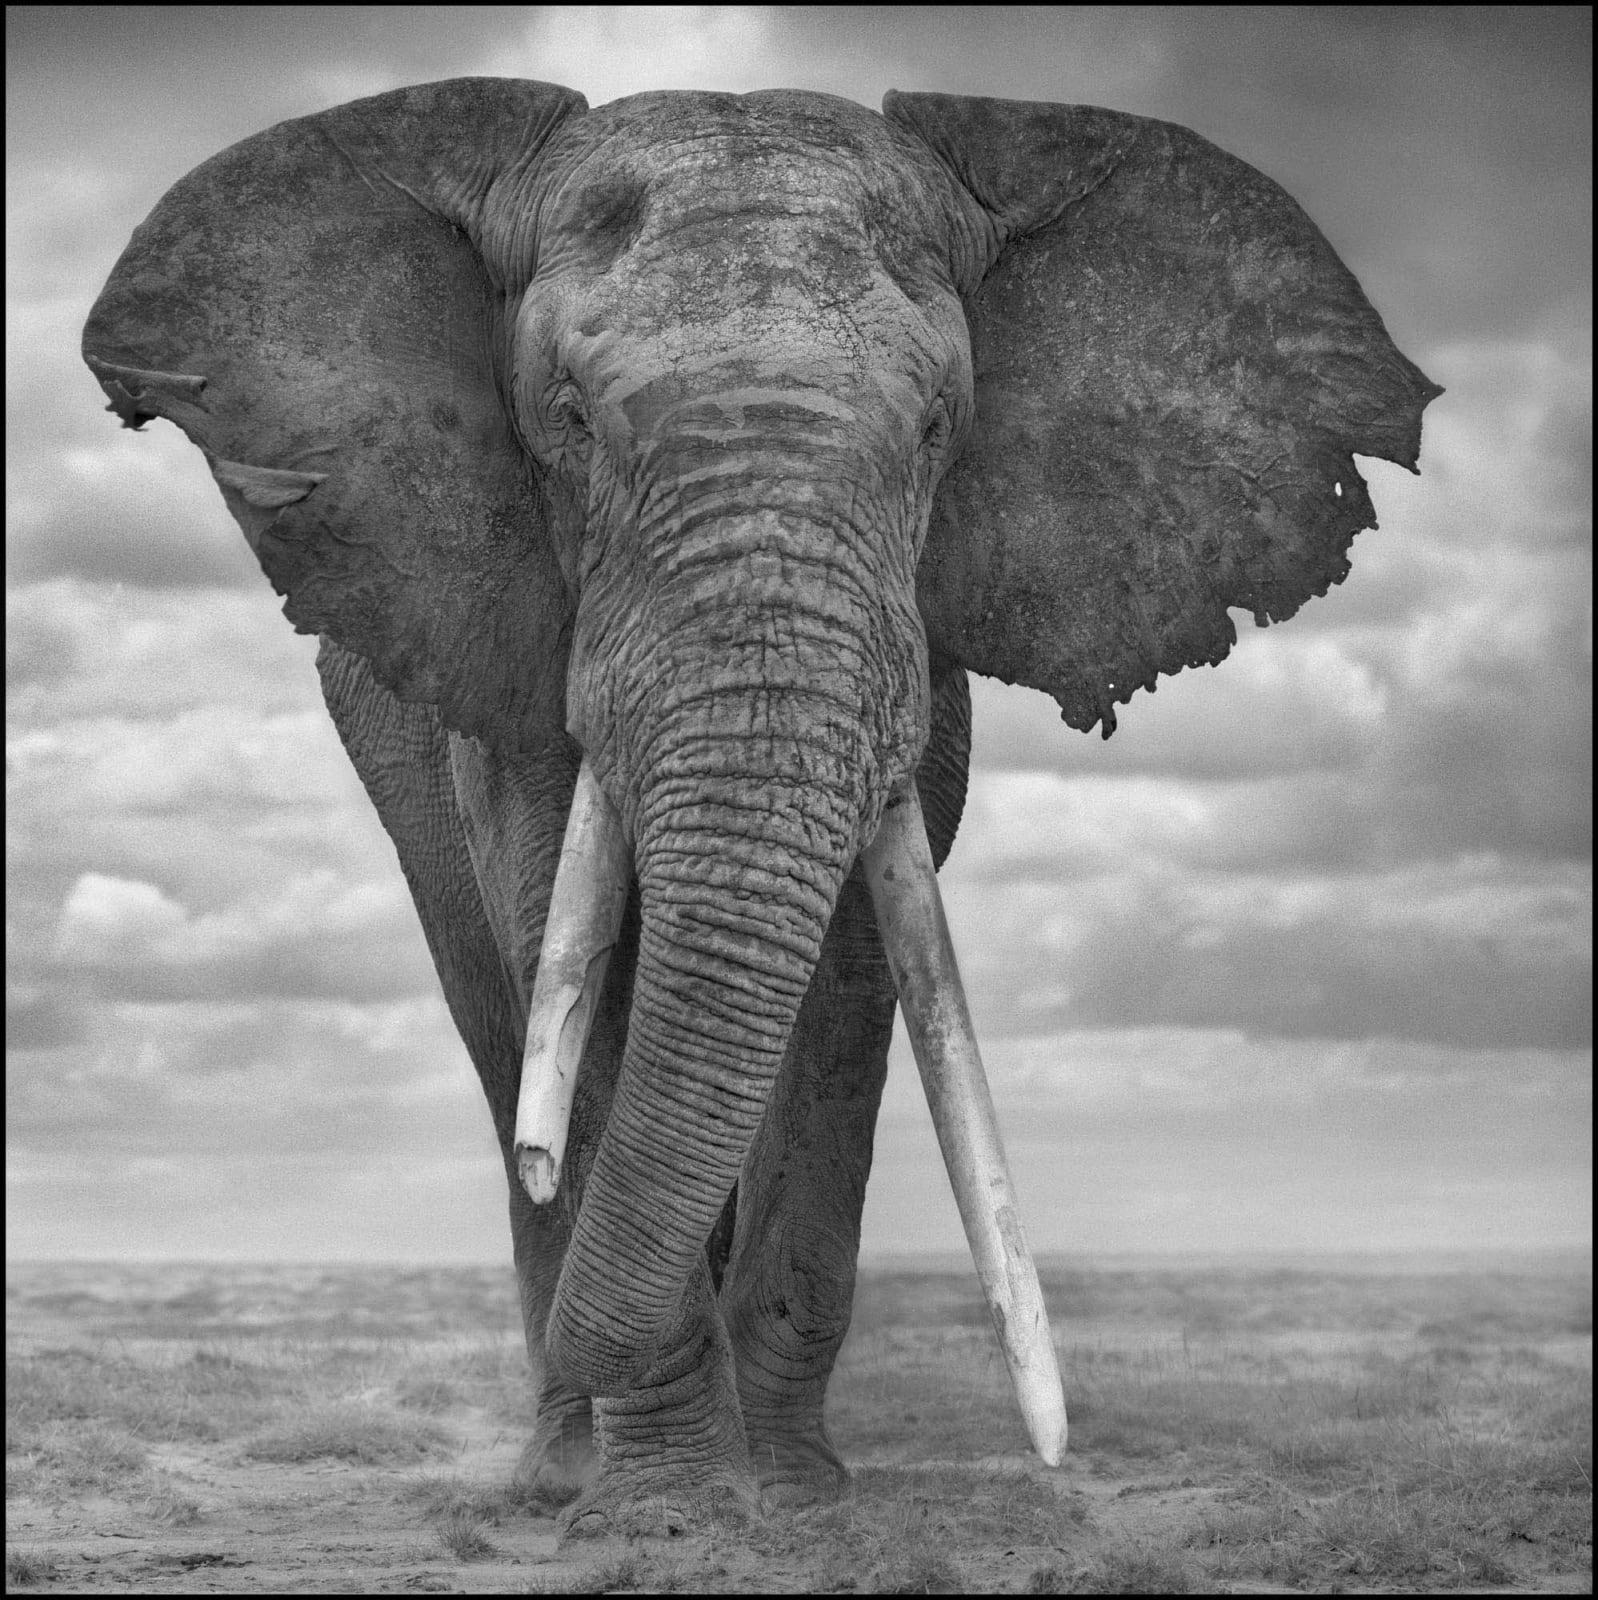 Nick Brandt, Elephant Sails, 2008